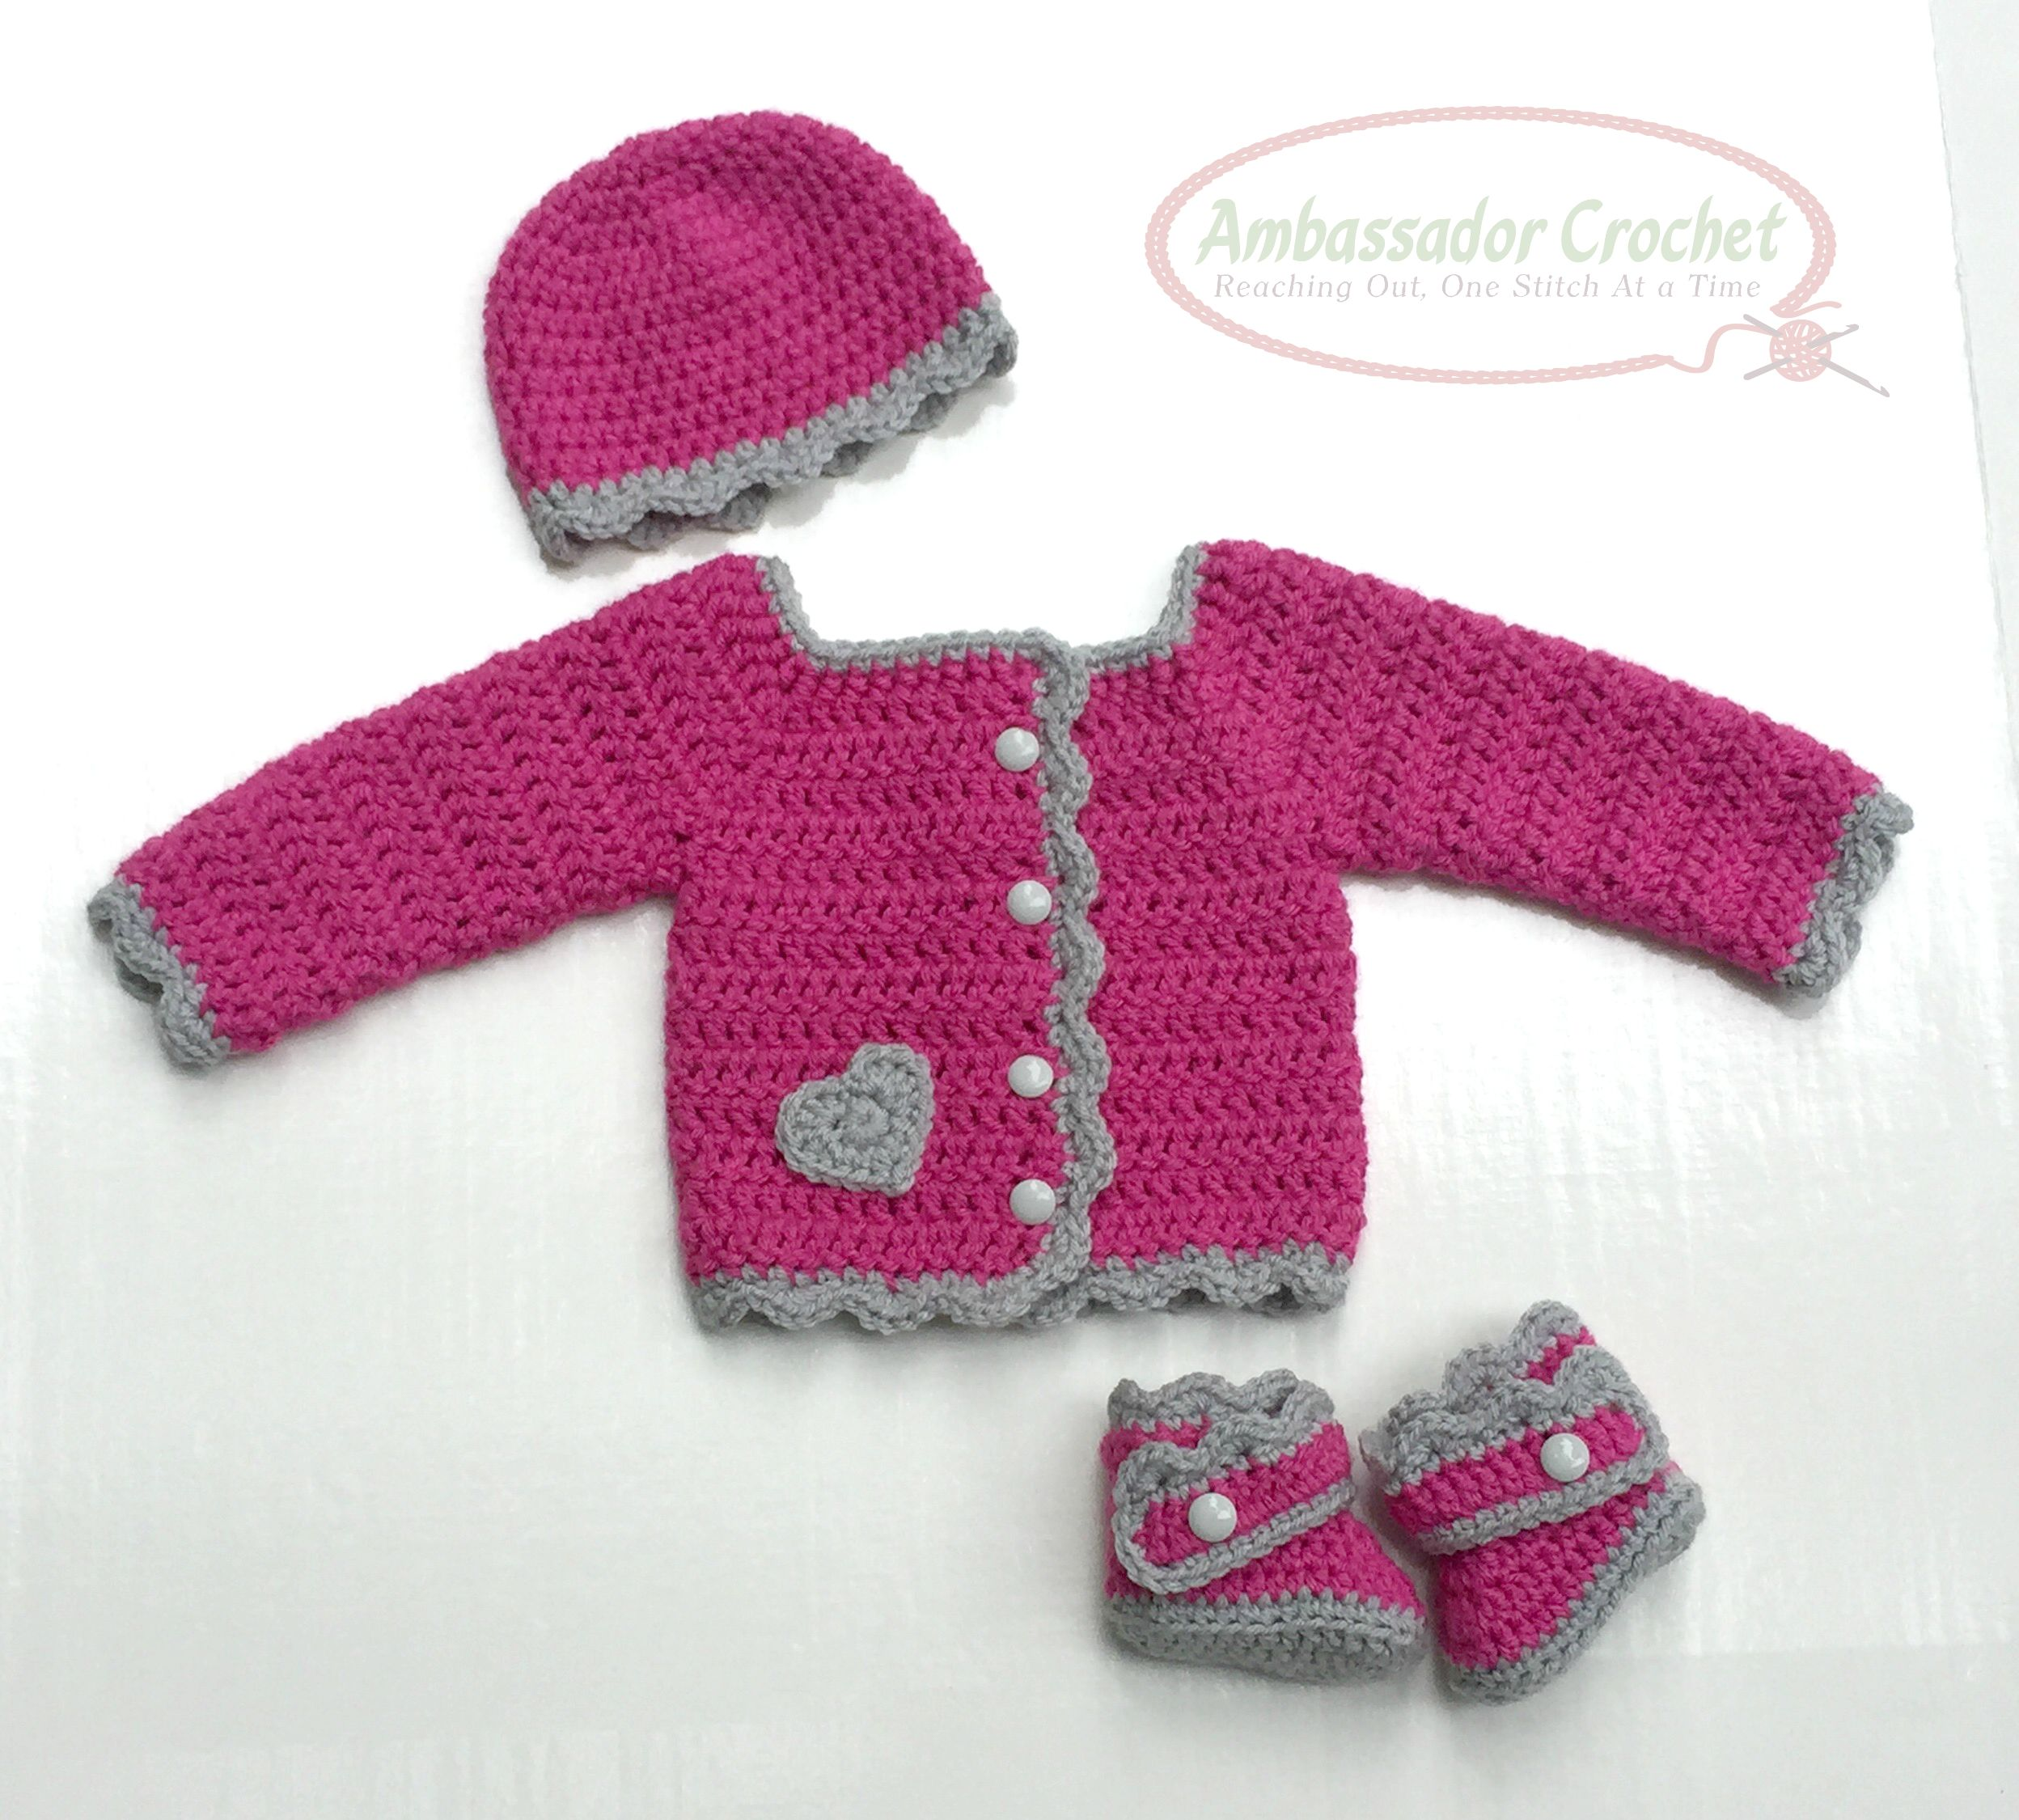 His & Hers Baby Layette Crochet Pattern PDF 216 - Ambassador Crochet